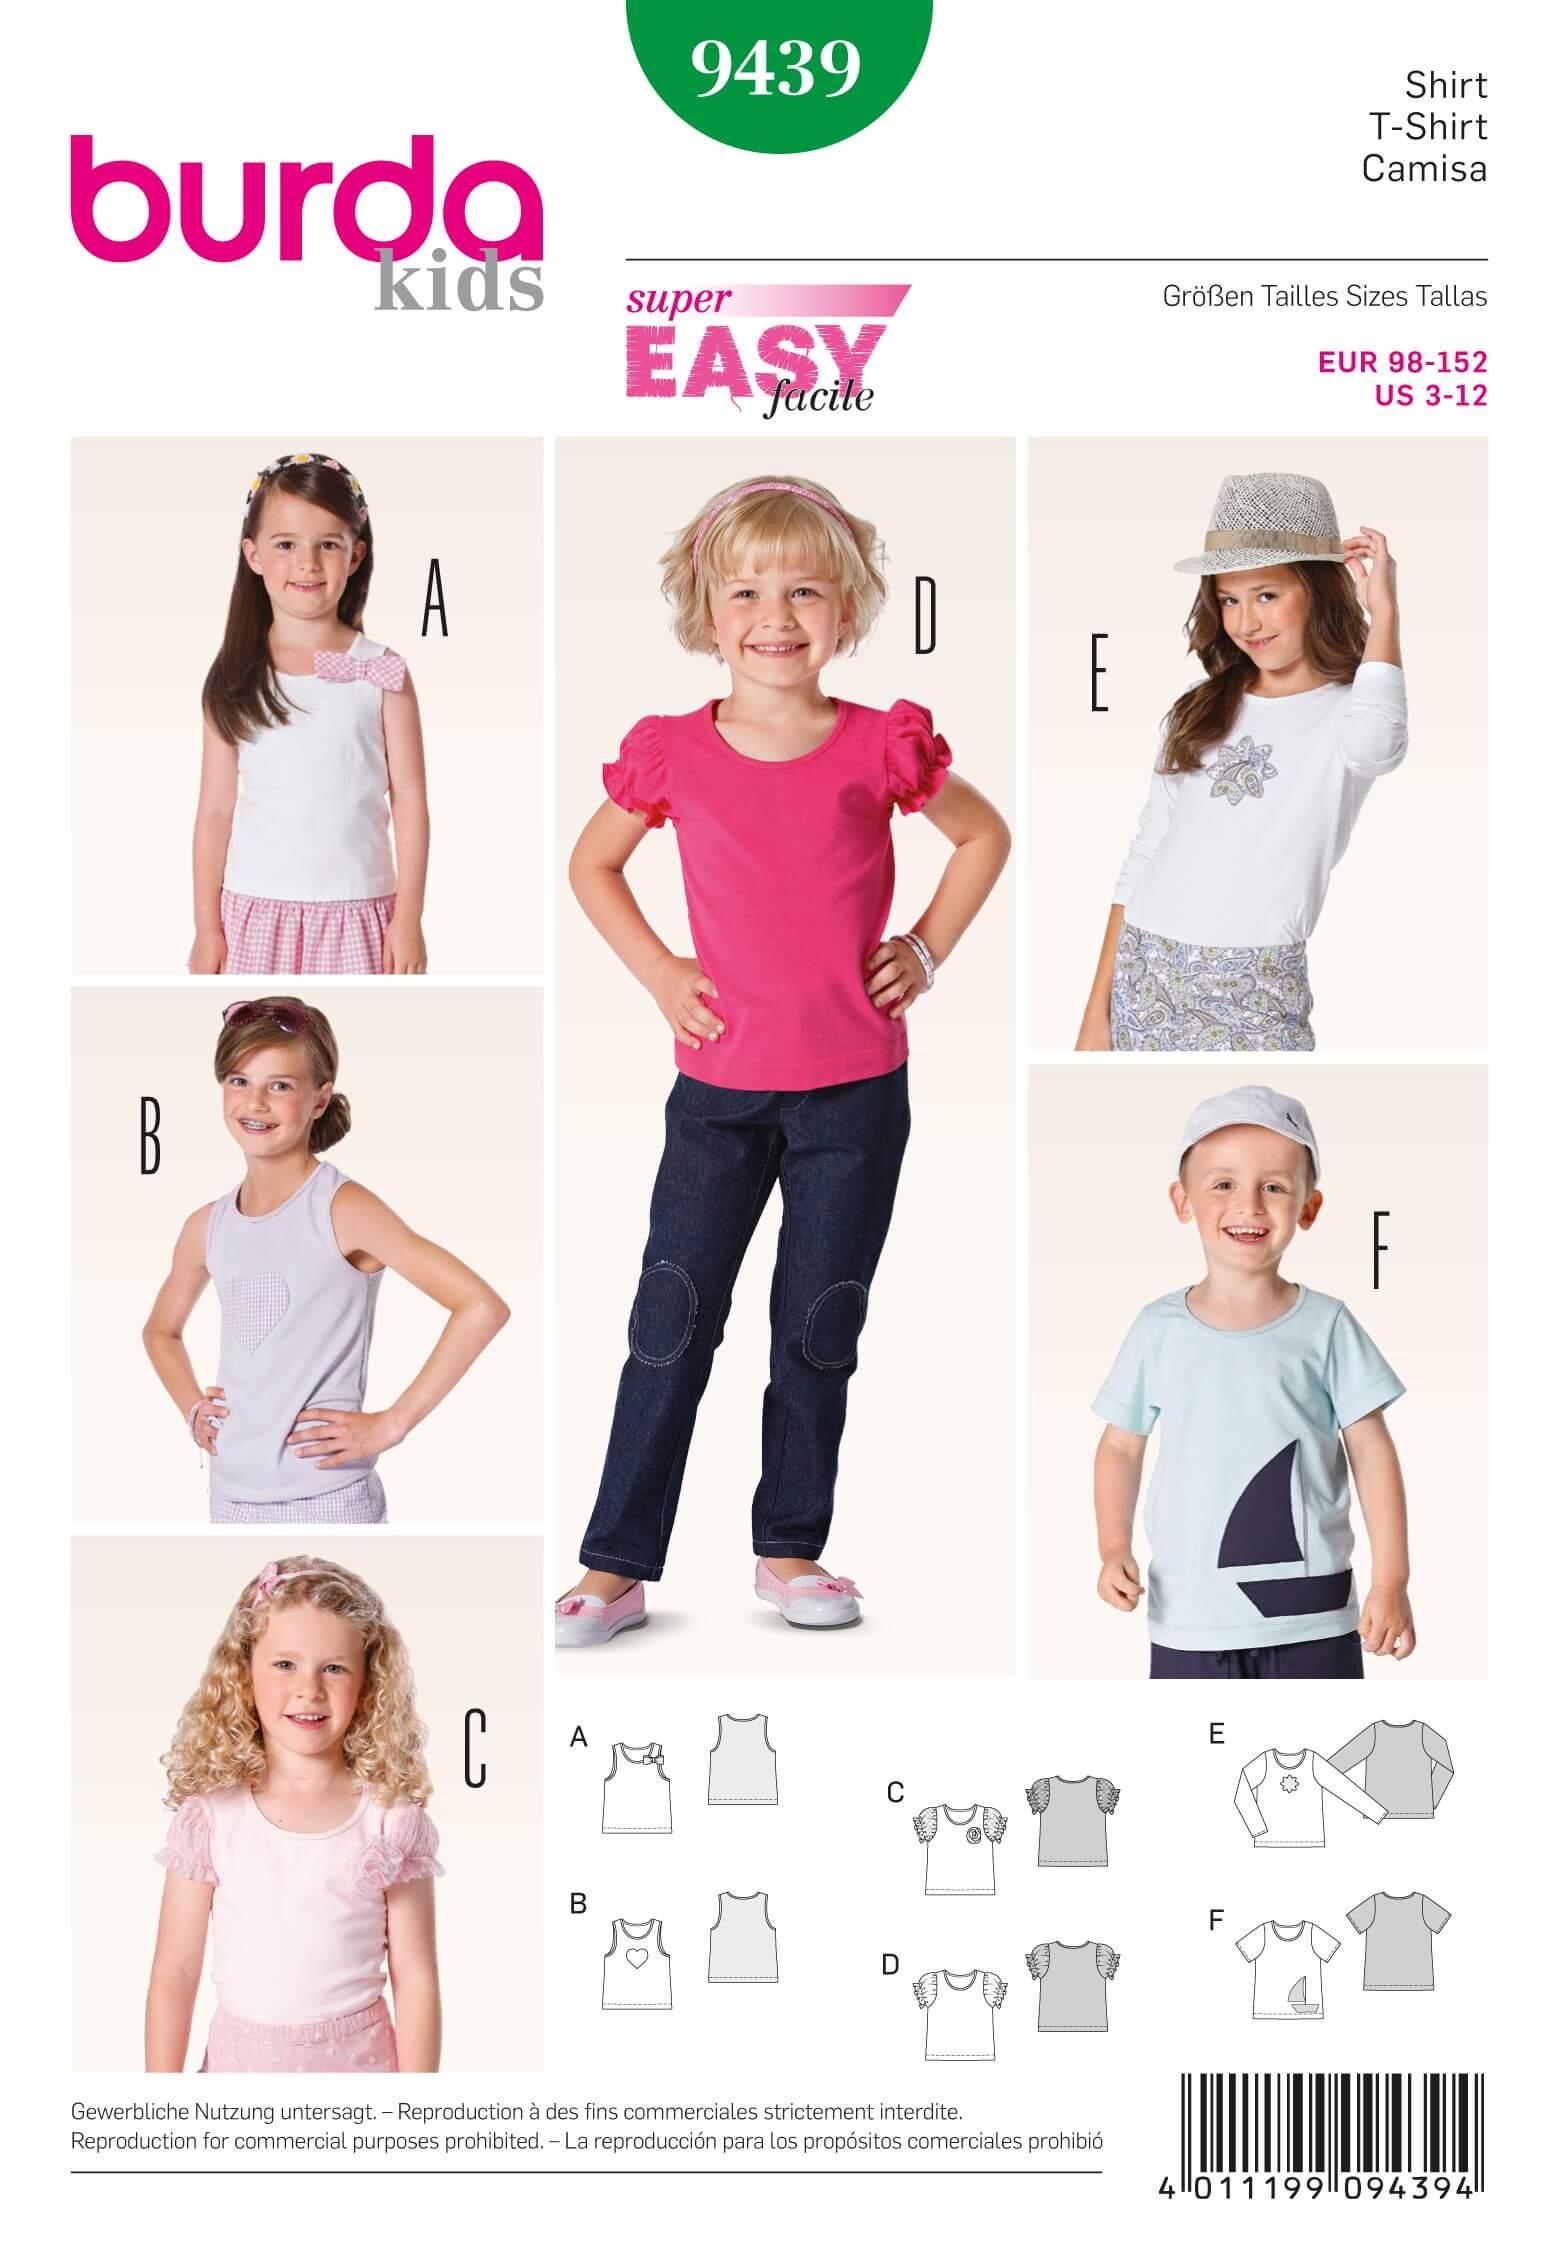 Burda Kids Girls Sleeved & Sleeveless Tops Fabric Sewing Pattern 9439